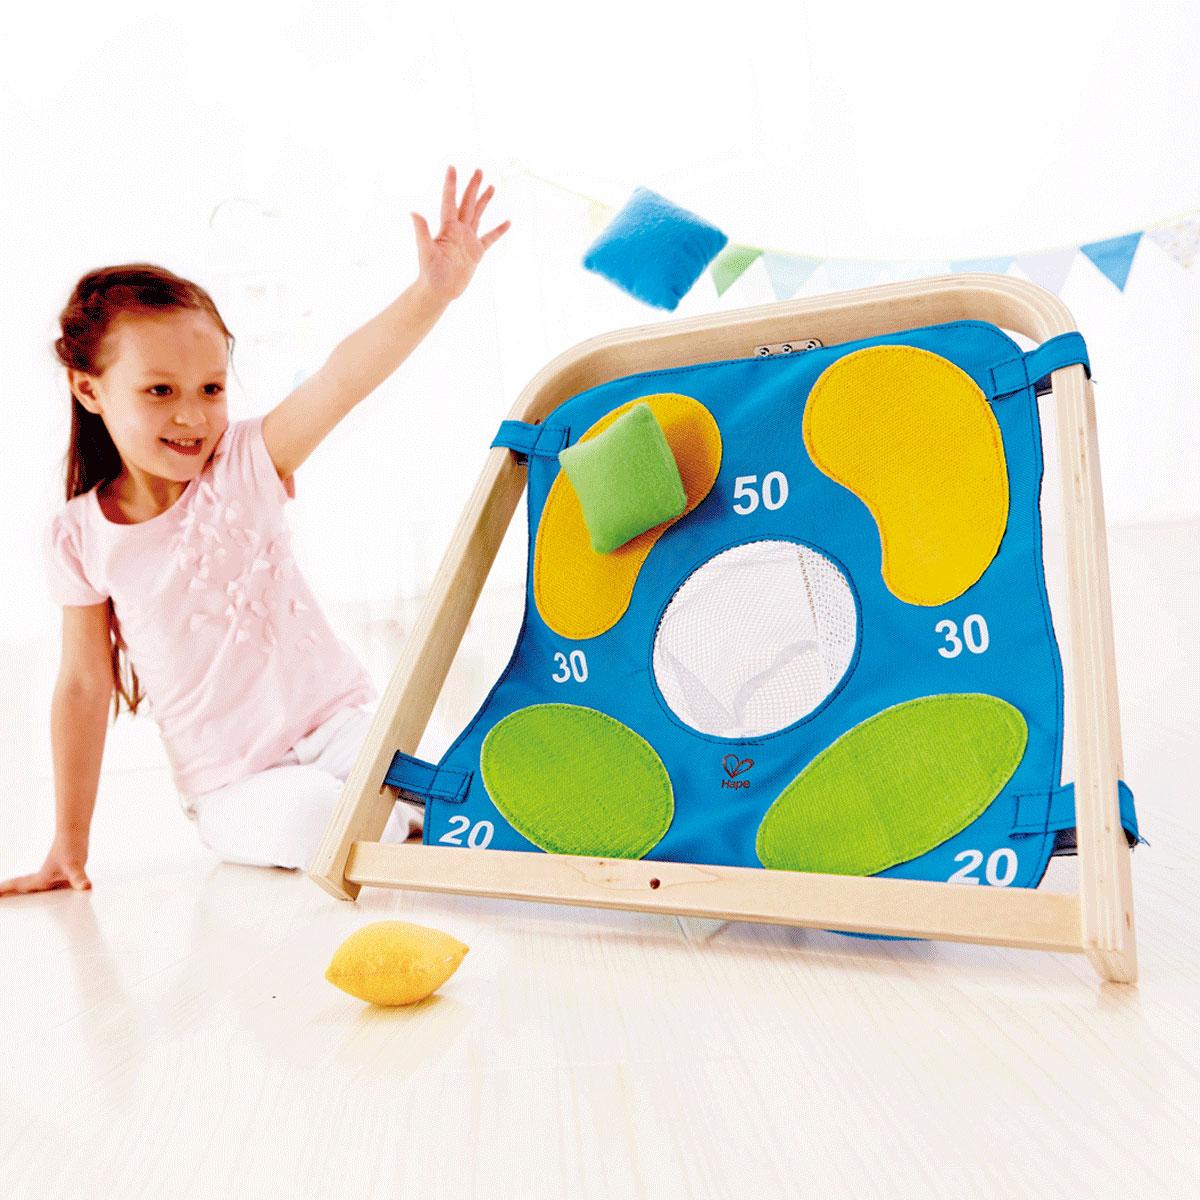 hape zielwerfen spielzeug f r draussen e4305. Black Bedroom Furniture Sets. Home Design Ideas